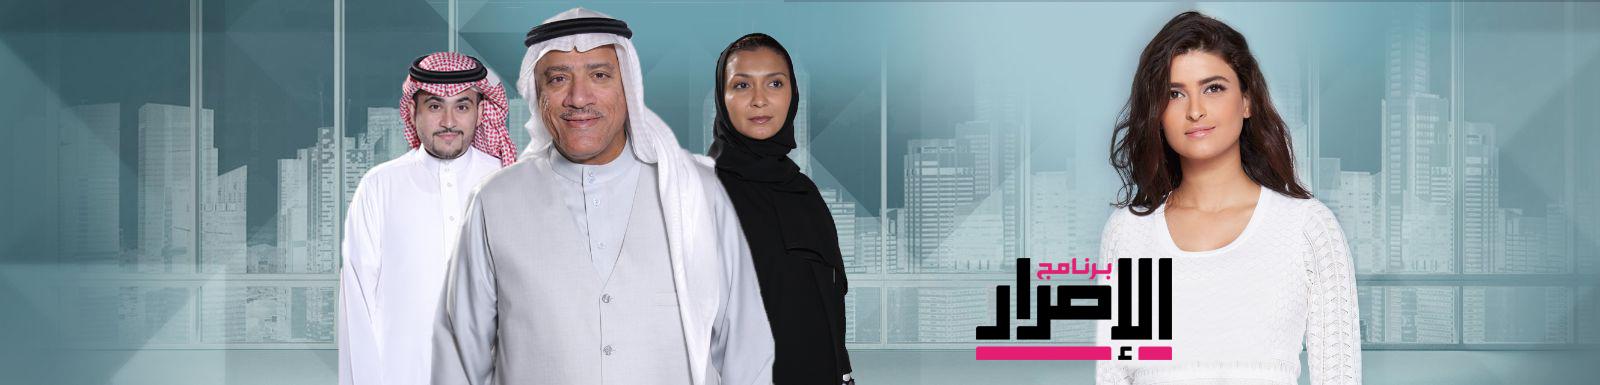 ����� ������ ������� ������ 5 ����� MBC shahid ���� ��